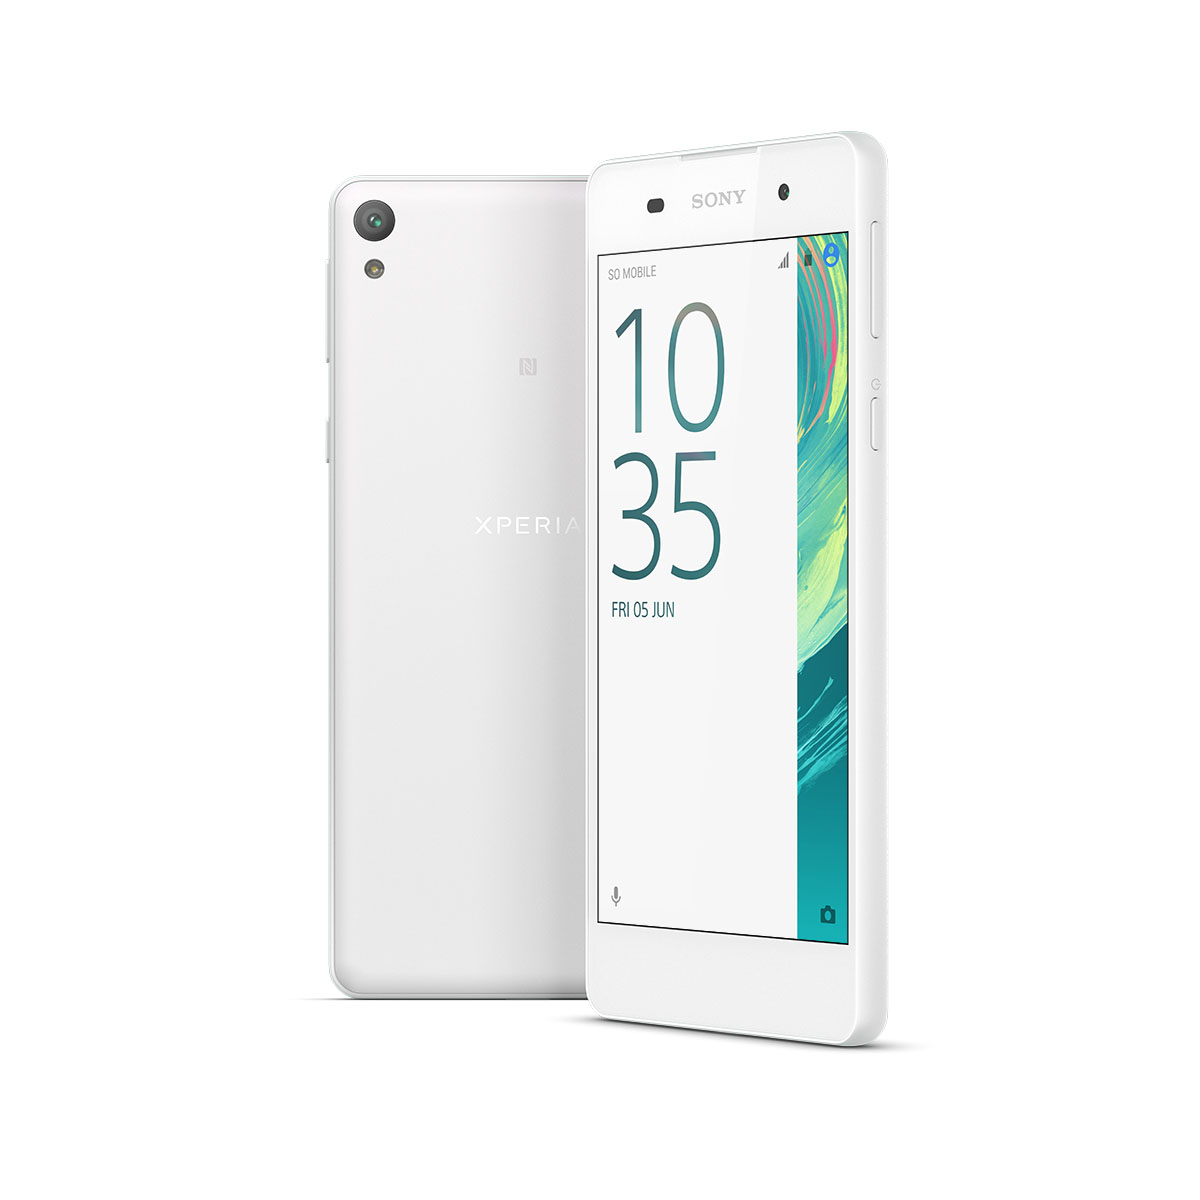 Celular Sony Xperia Color Lima (Telcel)